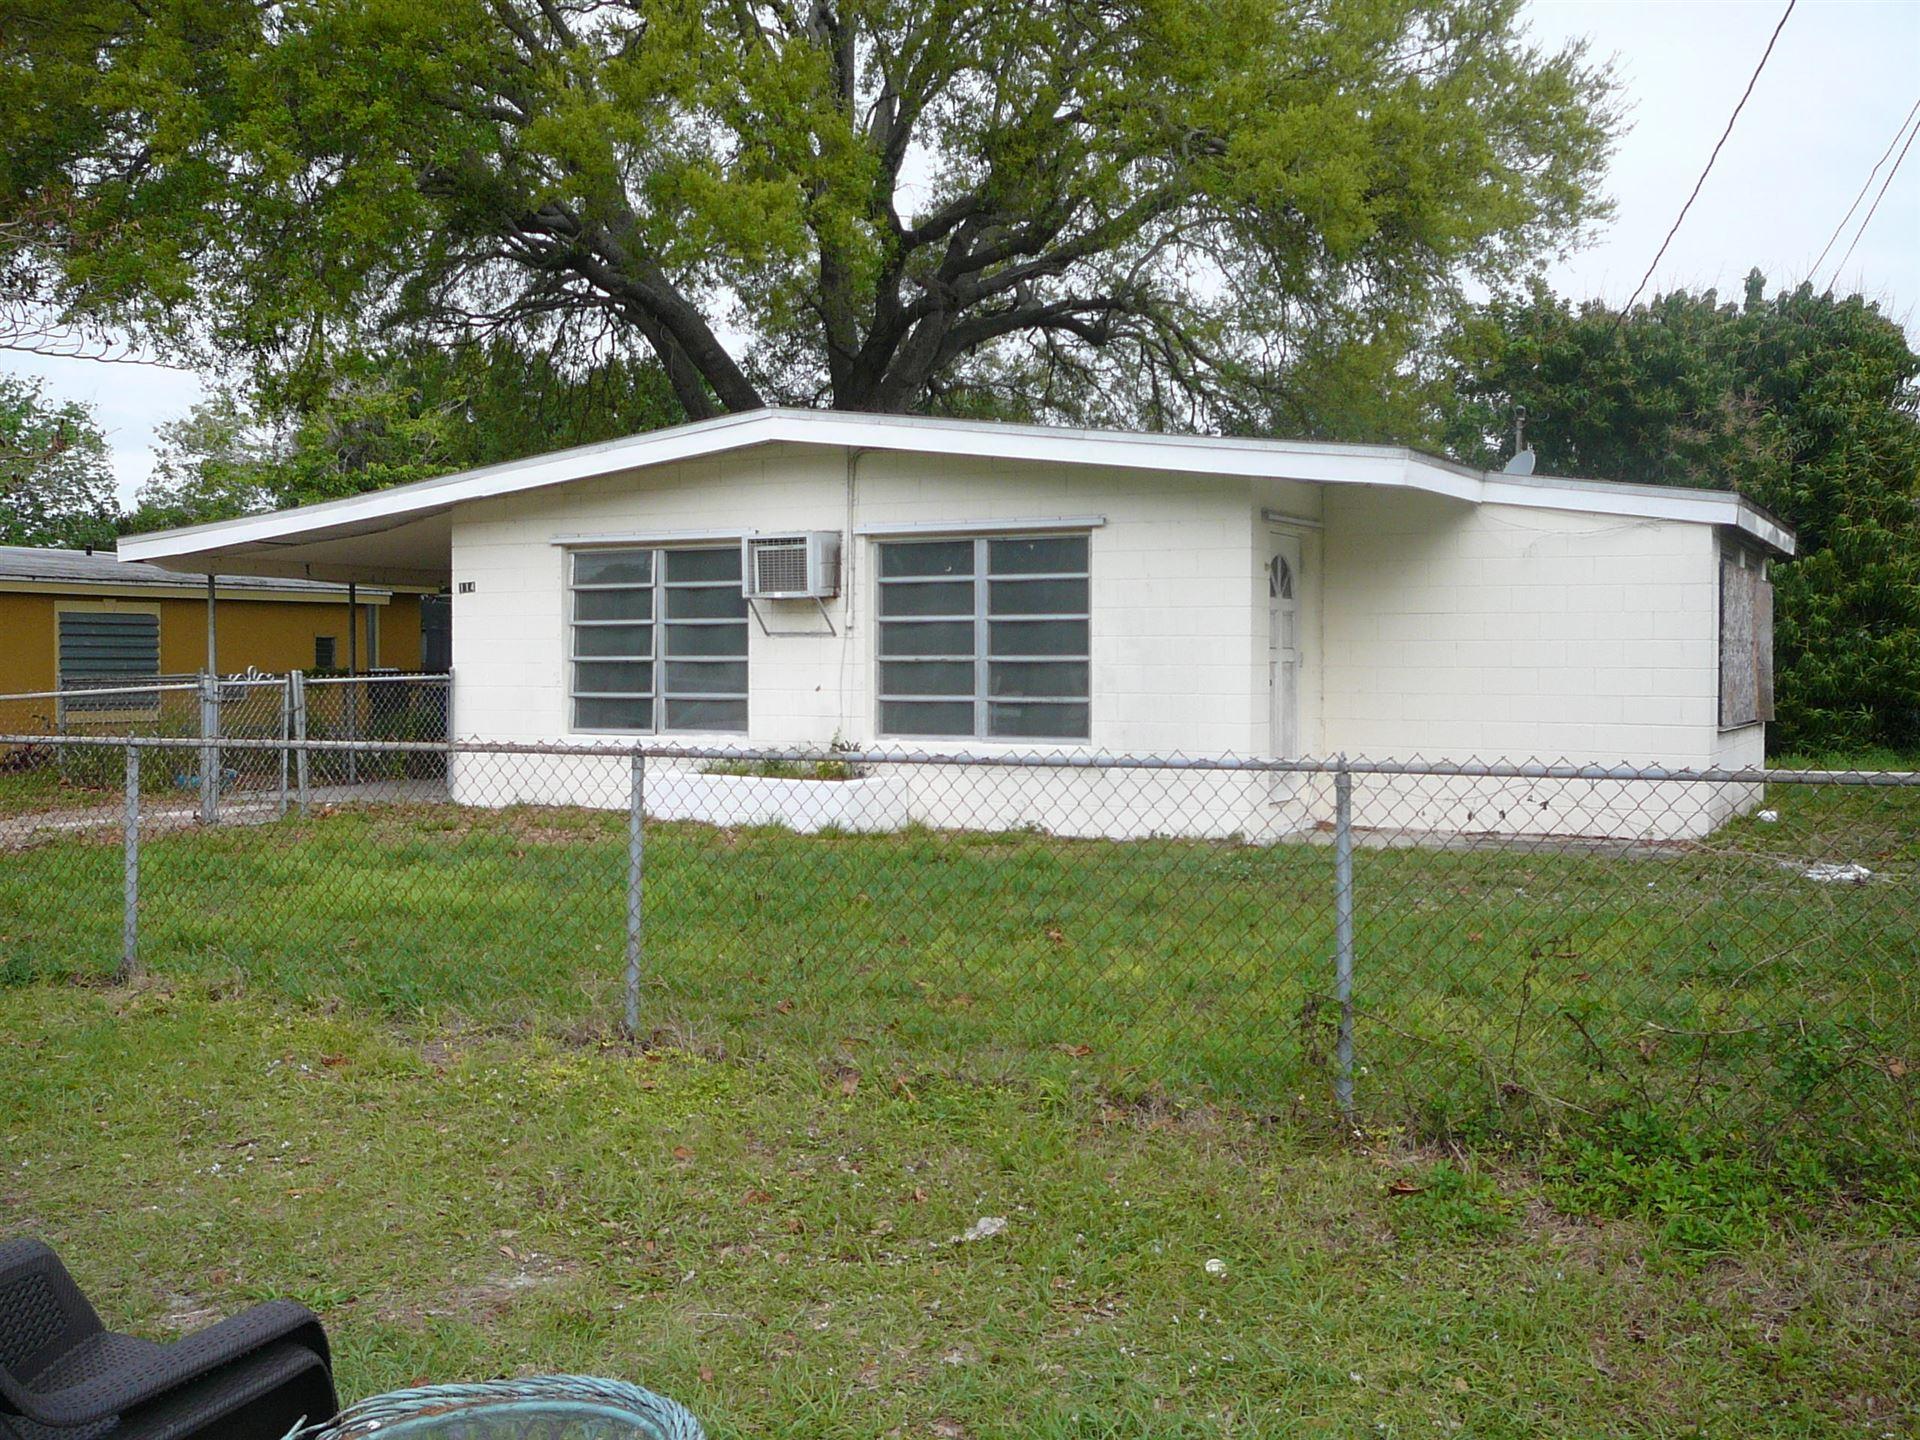 114 Roselyn Avenue, Fort Pierce, FL 34982 - #: RX-10660718